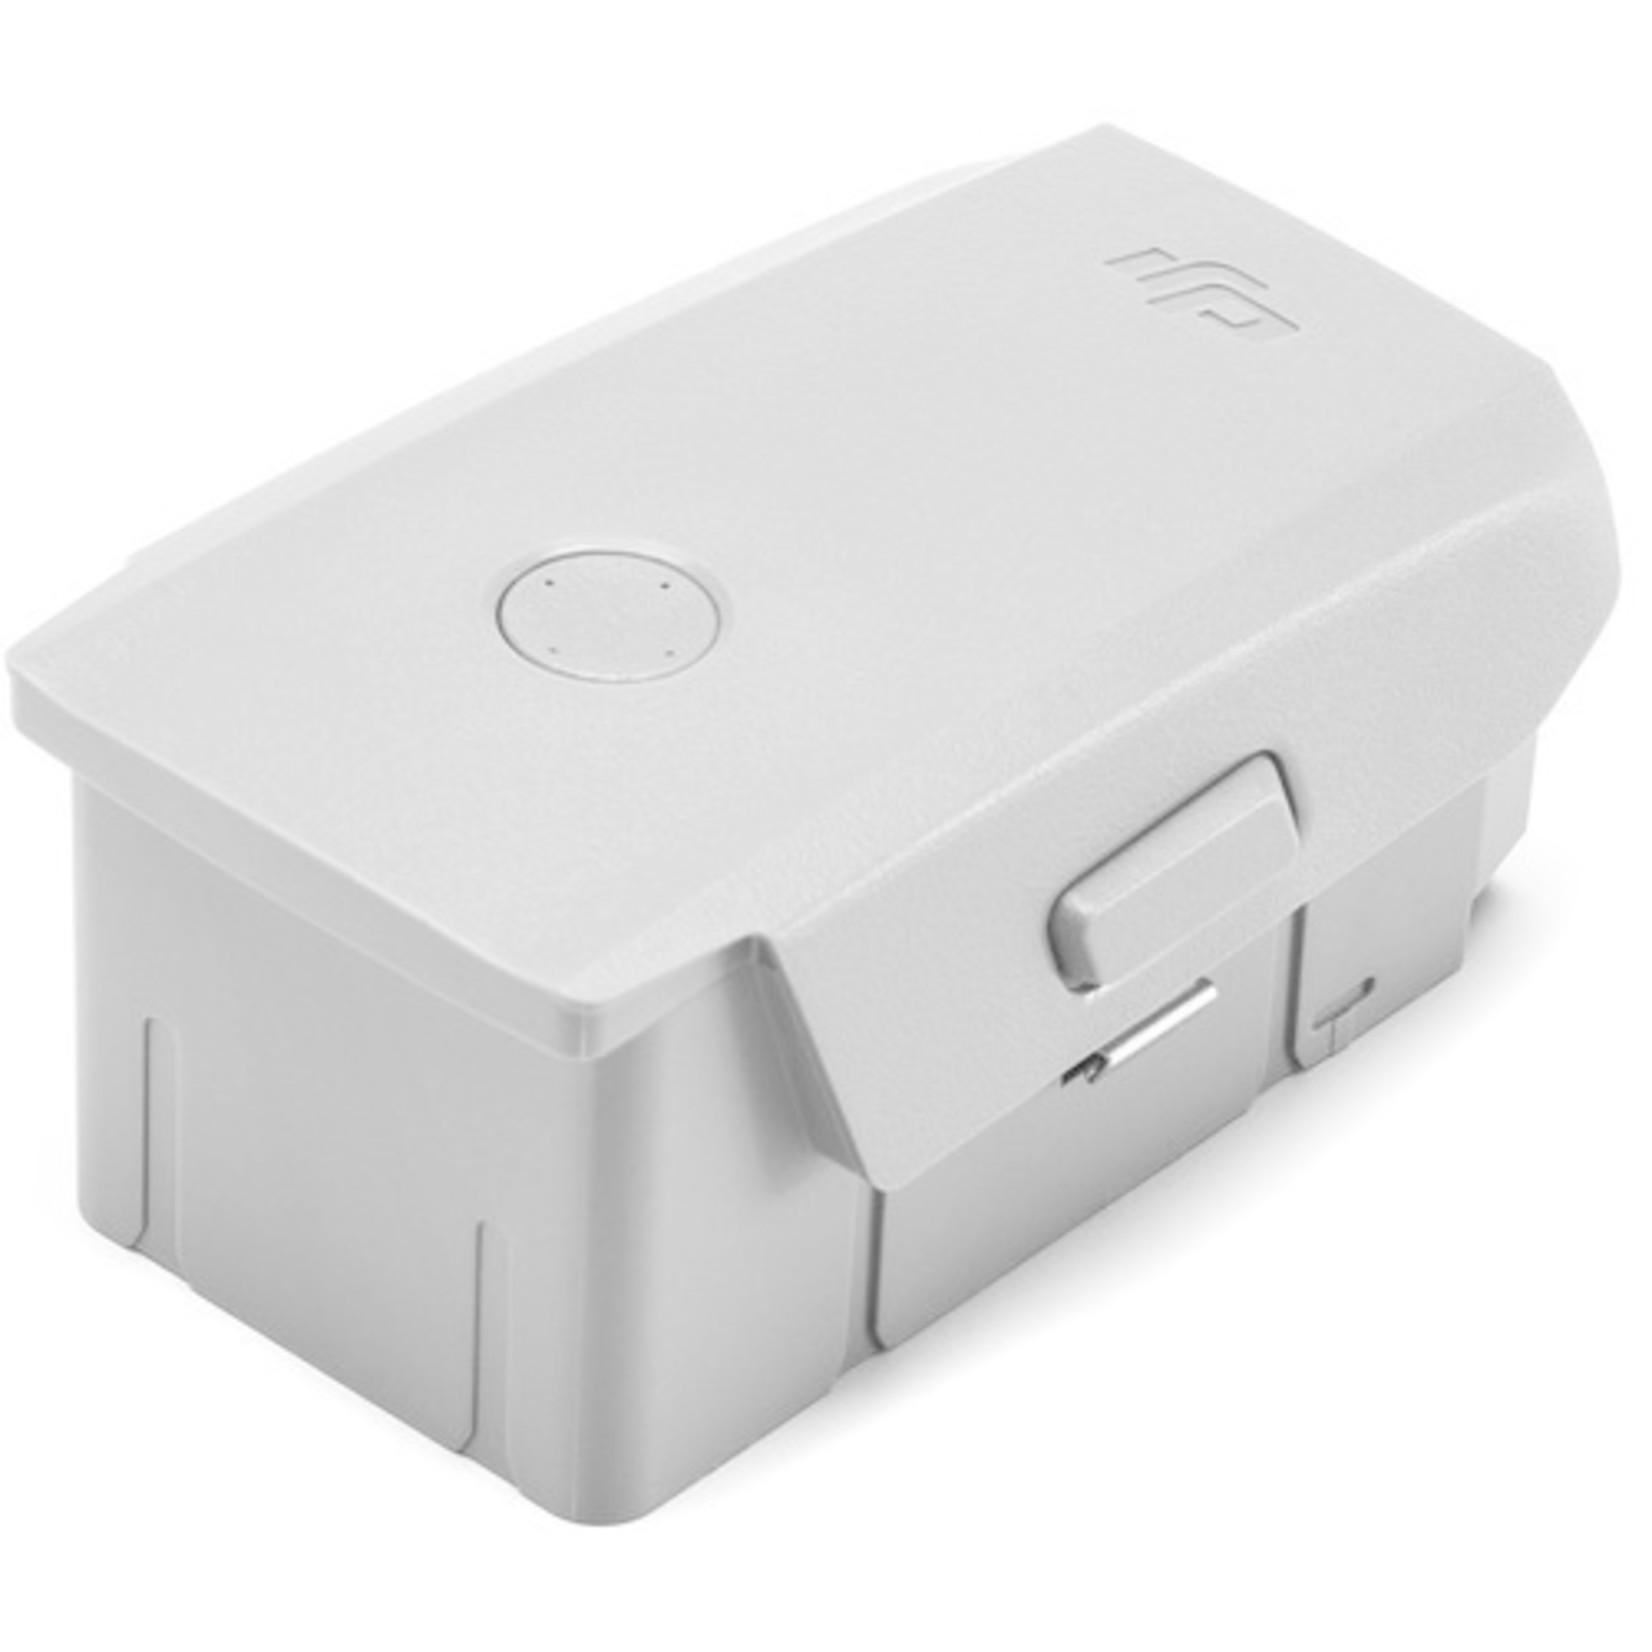 DJI DJI Intelligent Flight Battery for Air 2S & Mavic Air 2